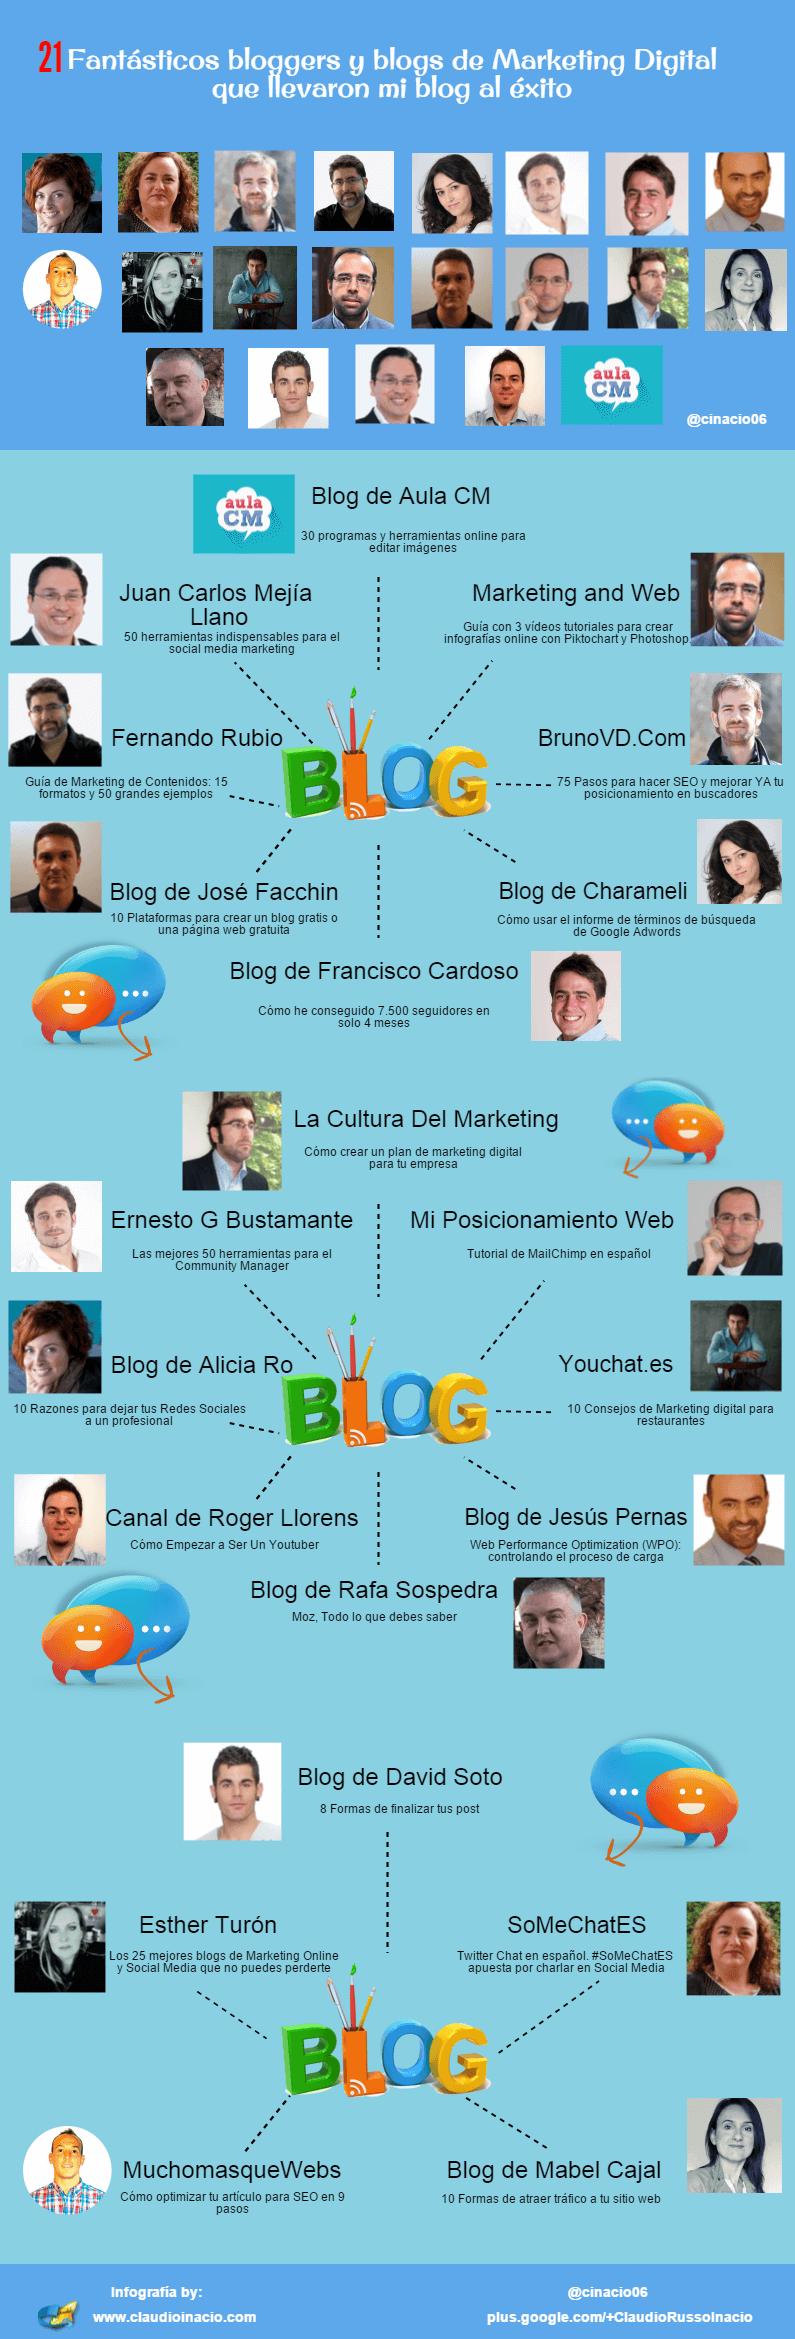 Blogs Claudio de marketing digital